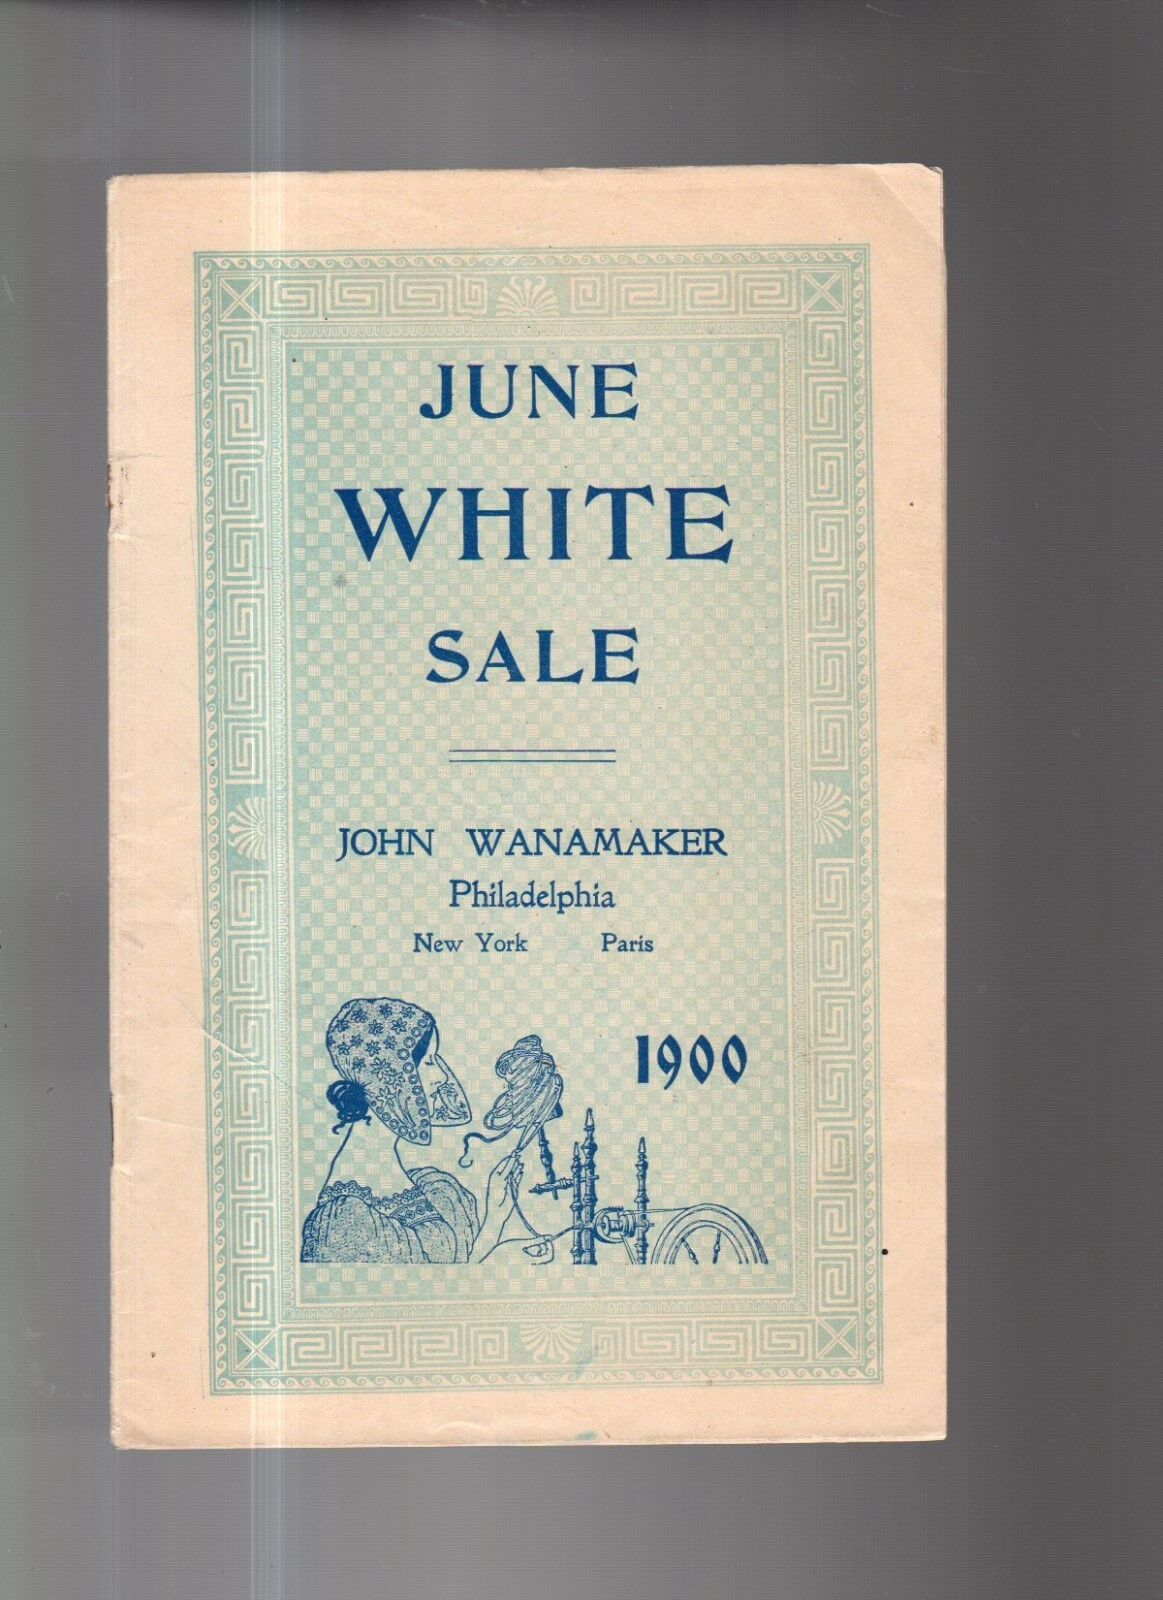 1900 Wanamaker Weiß Angebot Katalog - Herren Shirts, Schlafanzug; Golf Röcke,